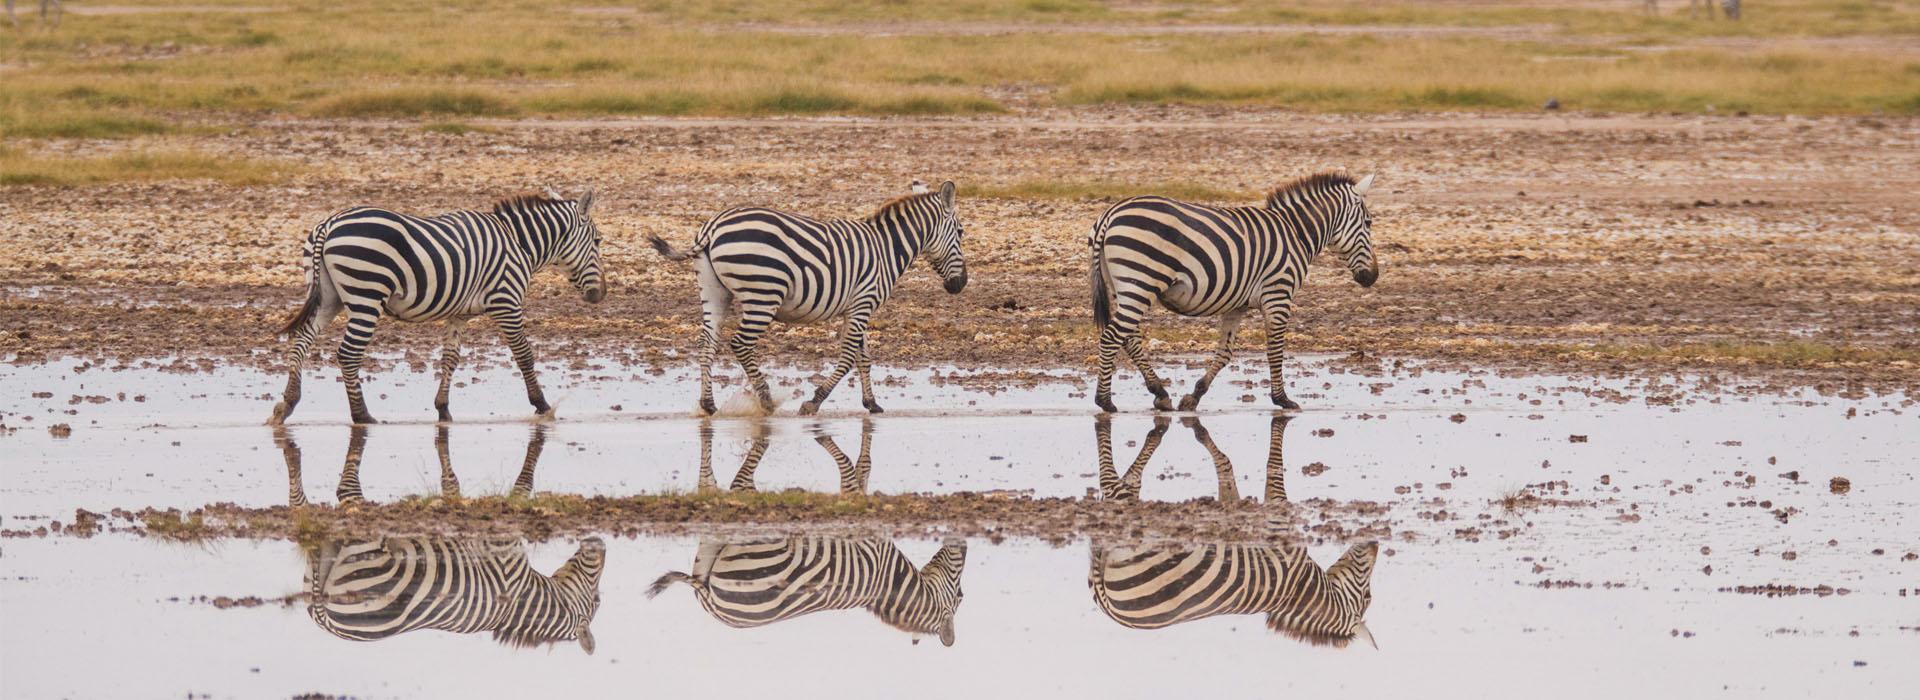 The Aberdares Top Destinations in Kenya - African Adventure Specialists